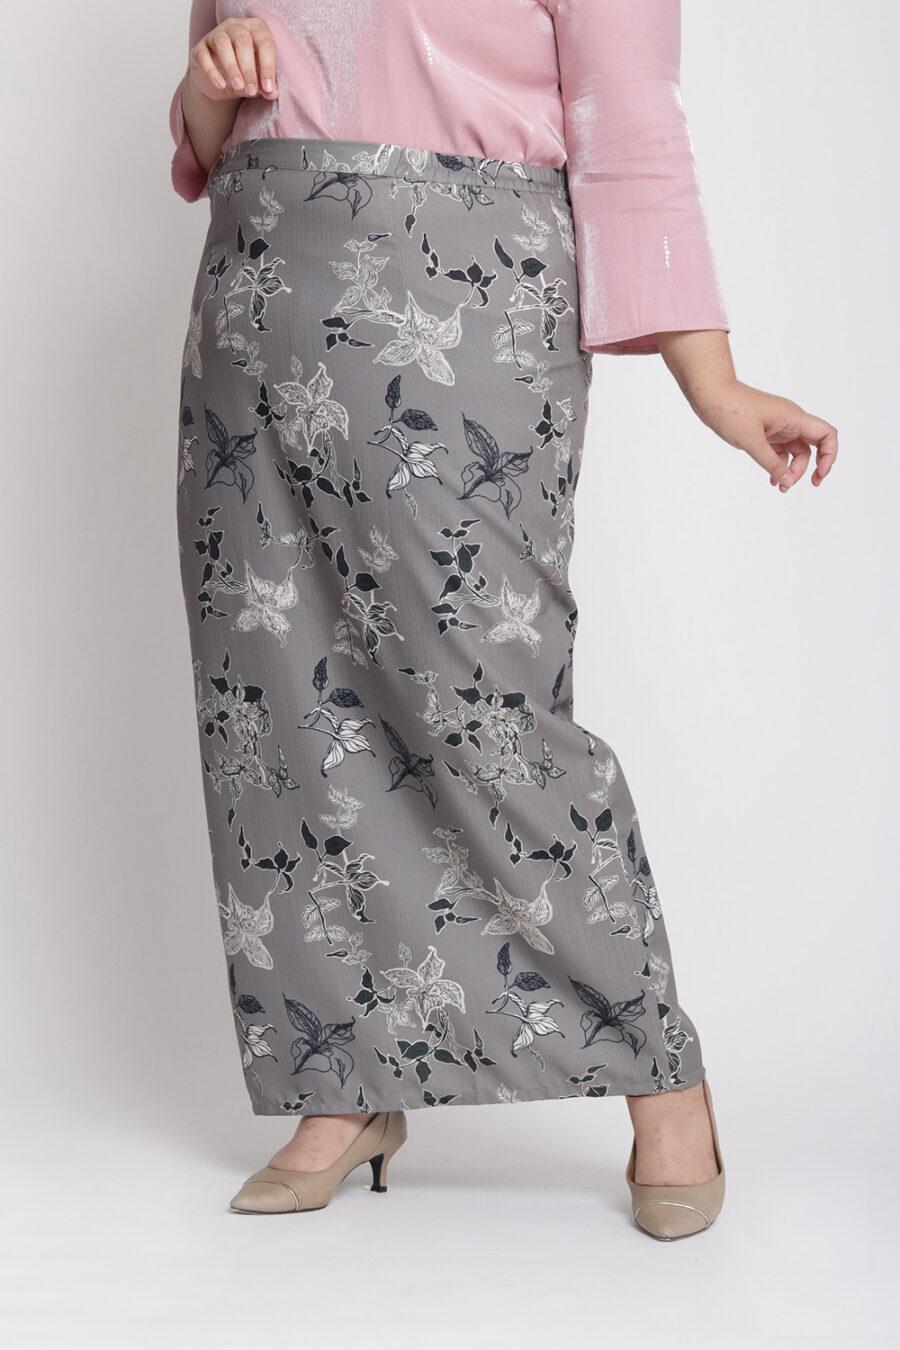 Amalia Plus Pencil Skirt Coco Brown